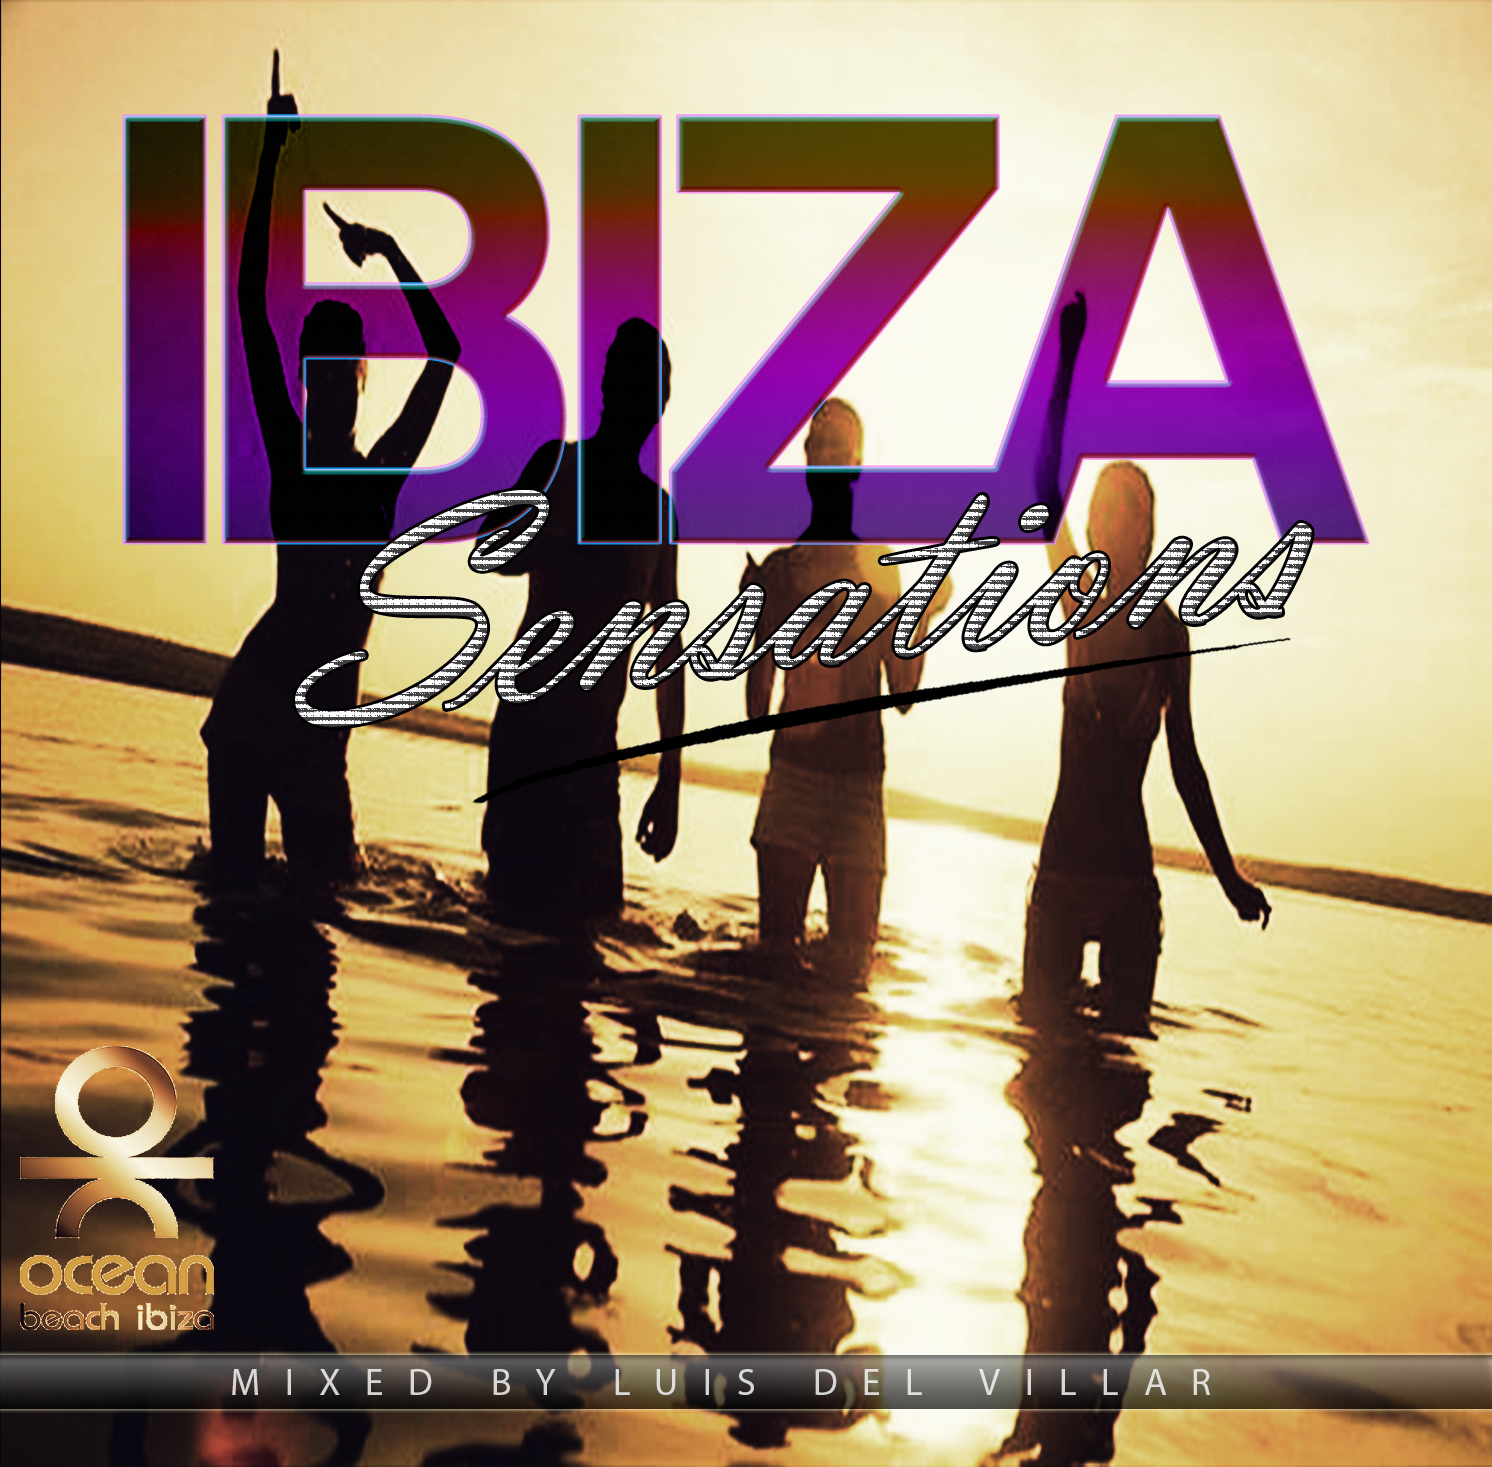 Artwork for Ibiza Sensations 108 @ Larida, LLeida